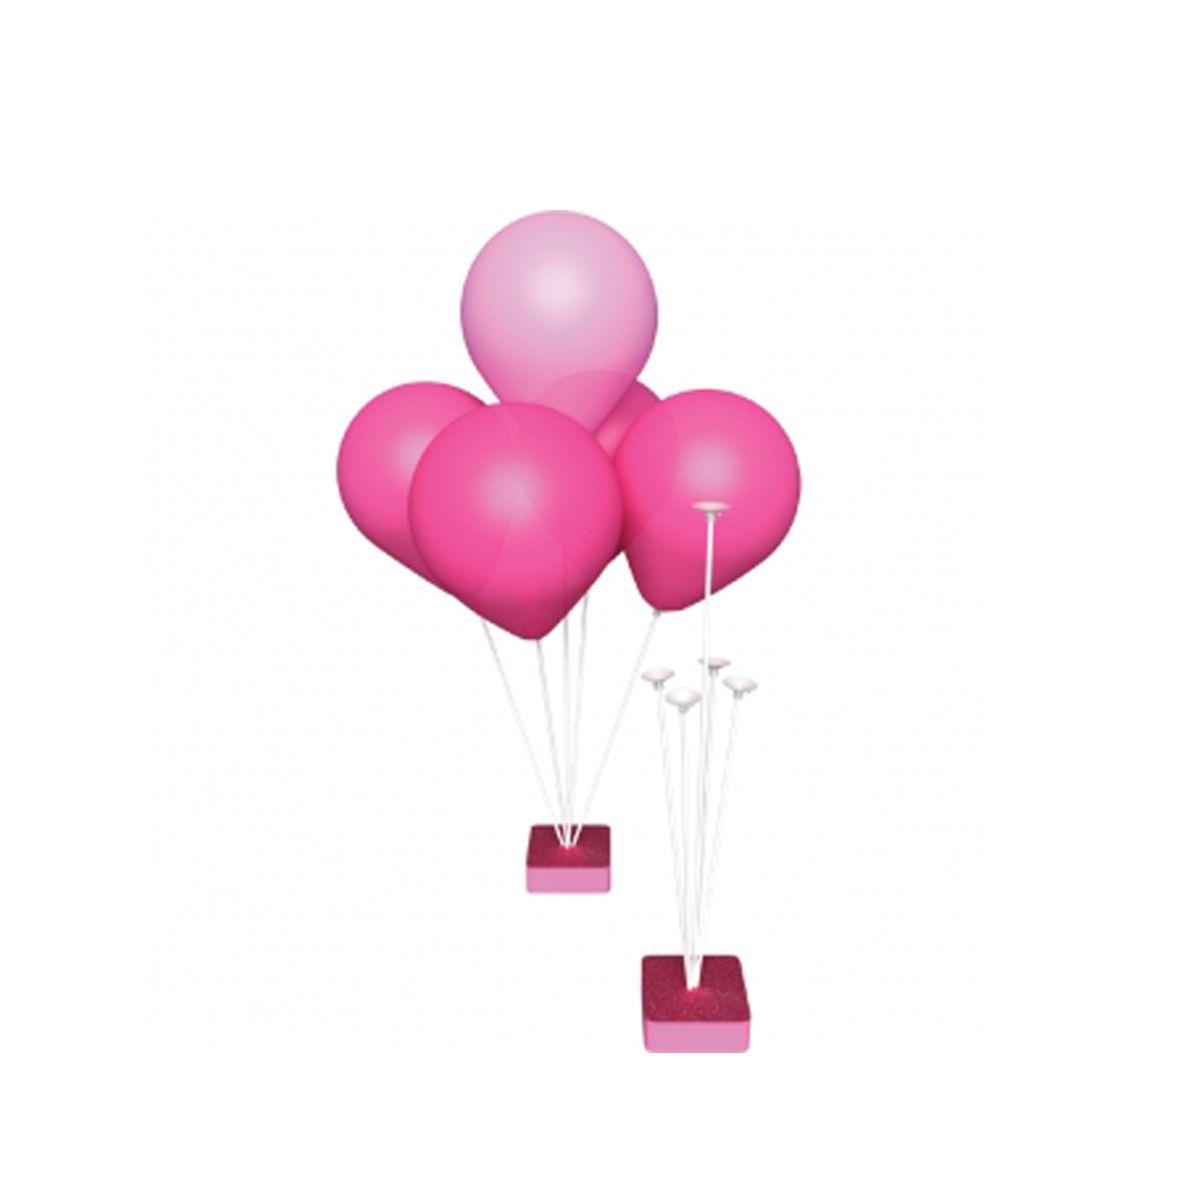 Suporte para Balões 5 Hastes Base Rosa 26cm Grintoy